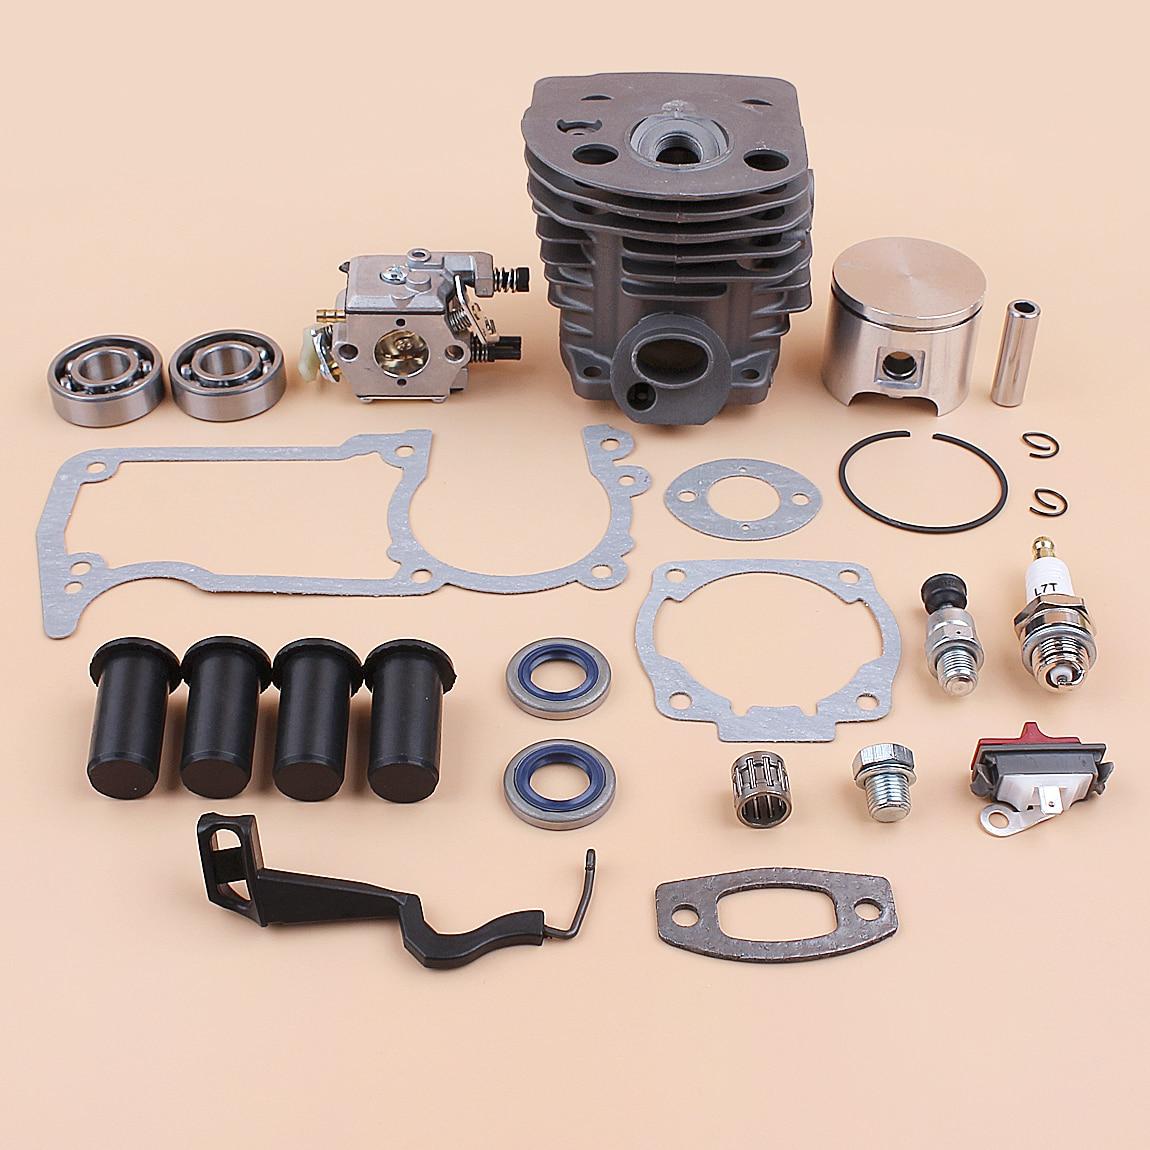 For 55 Cylinder 46MM Husqvarna Chainsaw Buffer Plug Kit Value 51 Release Choke Piston Rod Compression Carburetor AV Gaskets